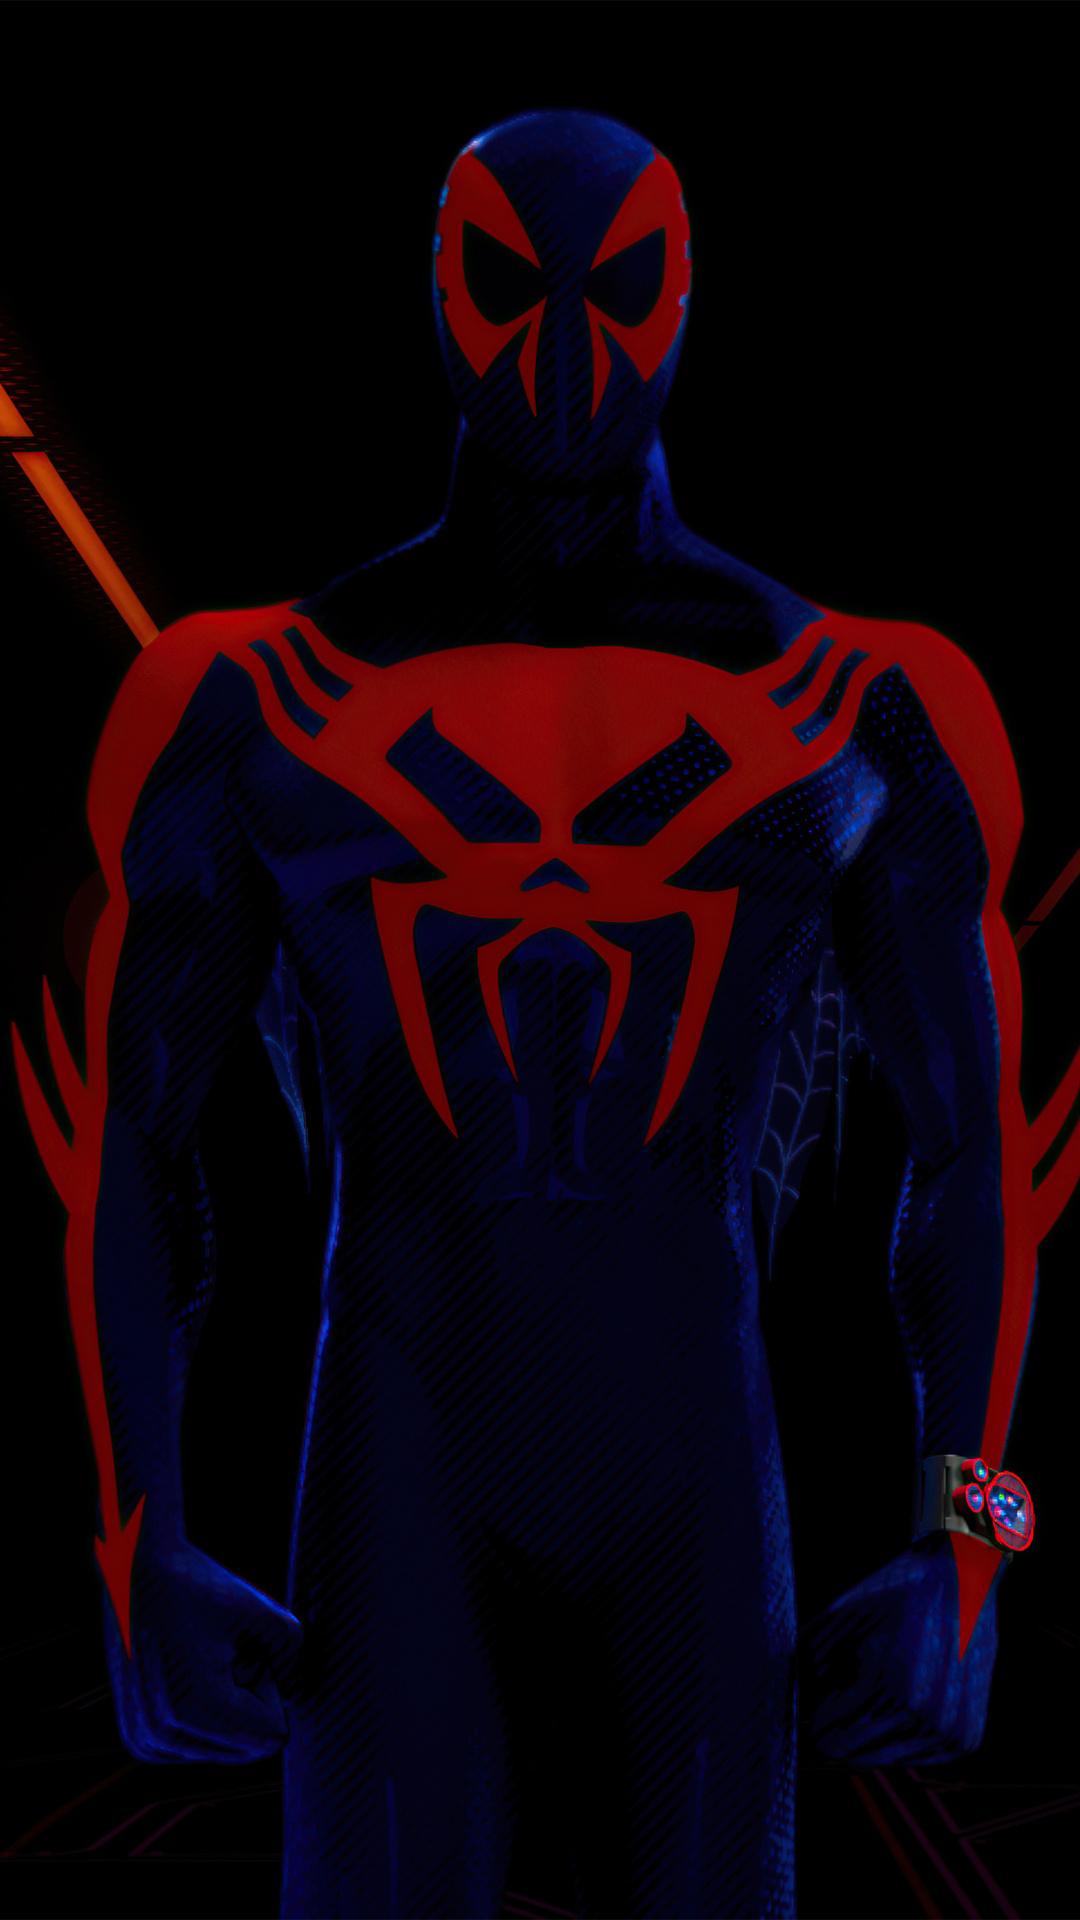 Spiderman Into the spider verse 2 wallpaper